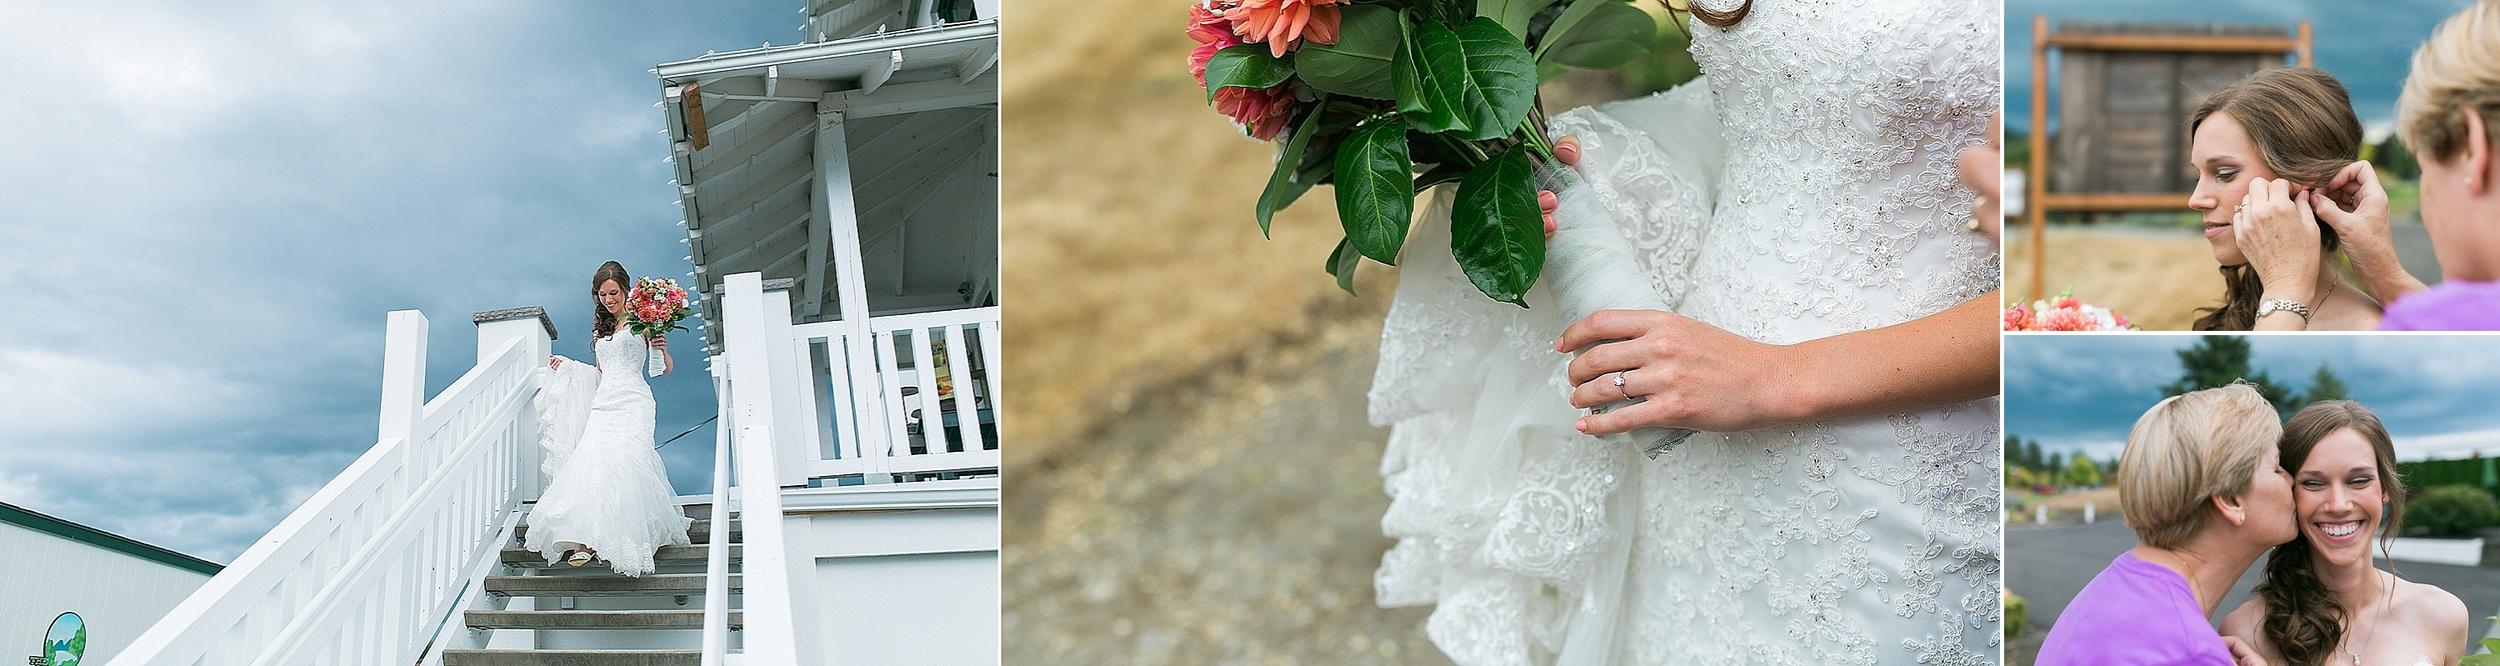 ashley vos photography seattle area wedding photographer_0647.jpg